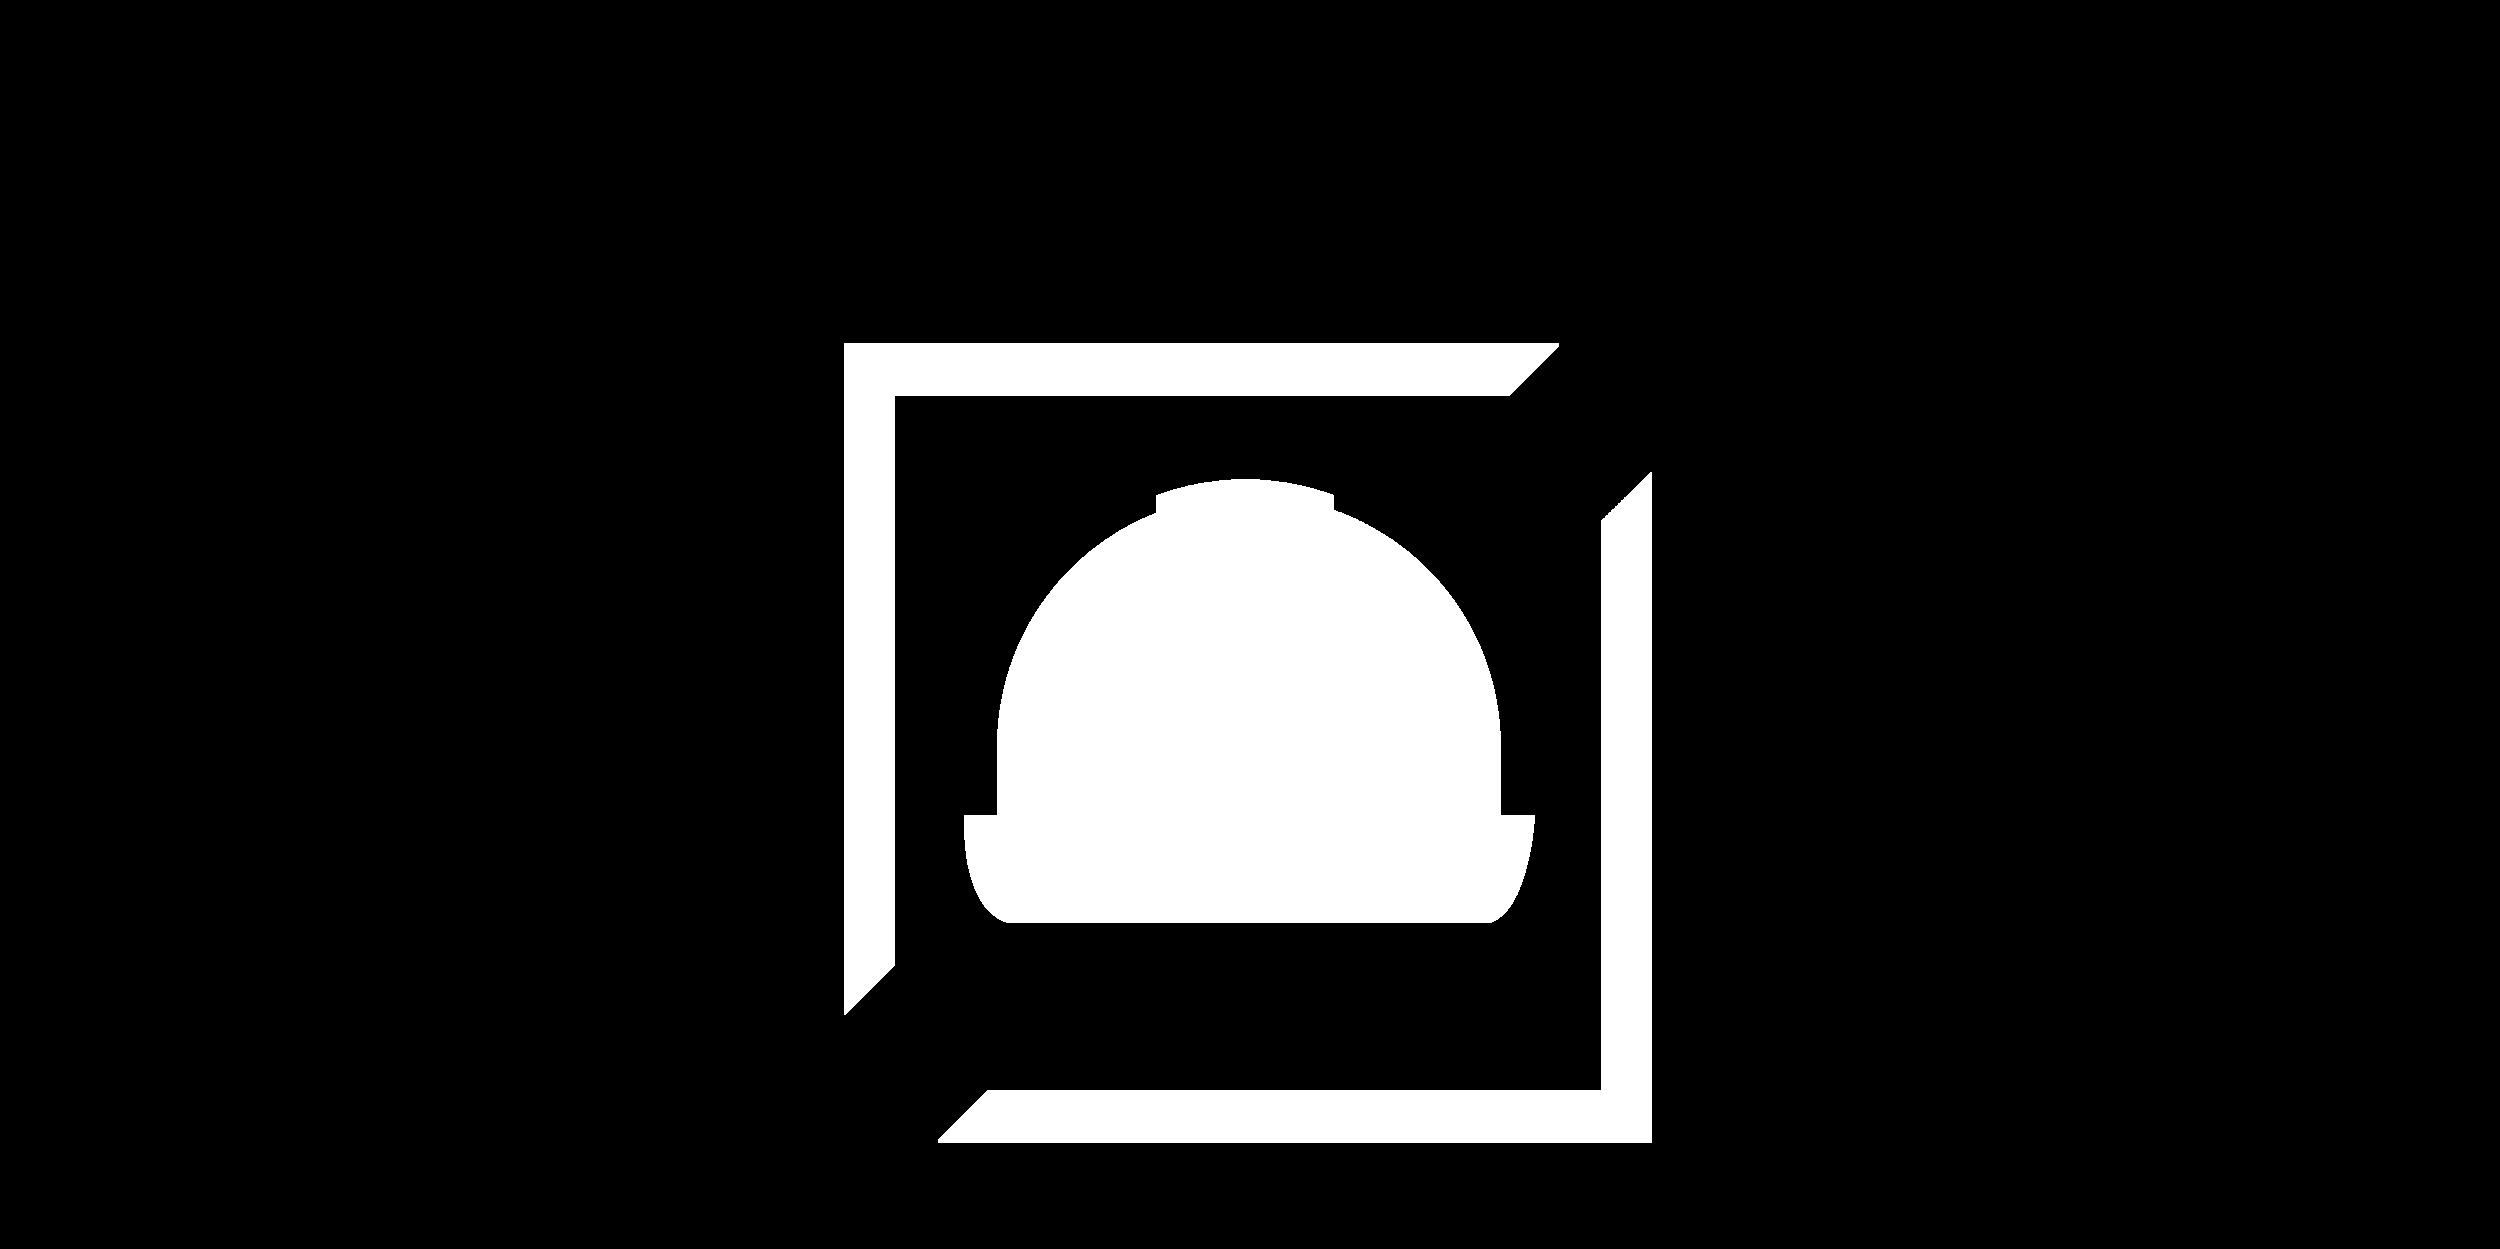 hard-hat-02-01.png